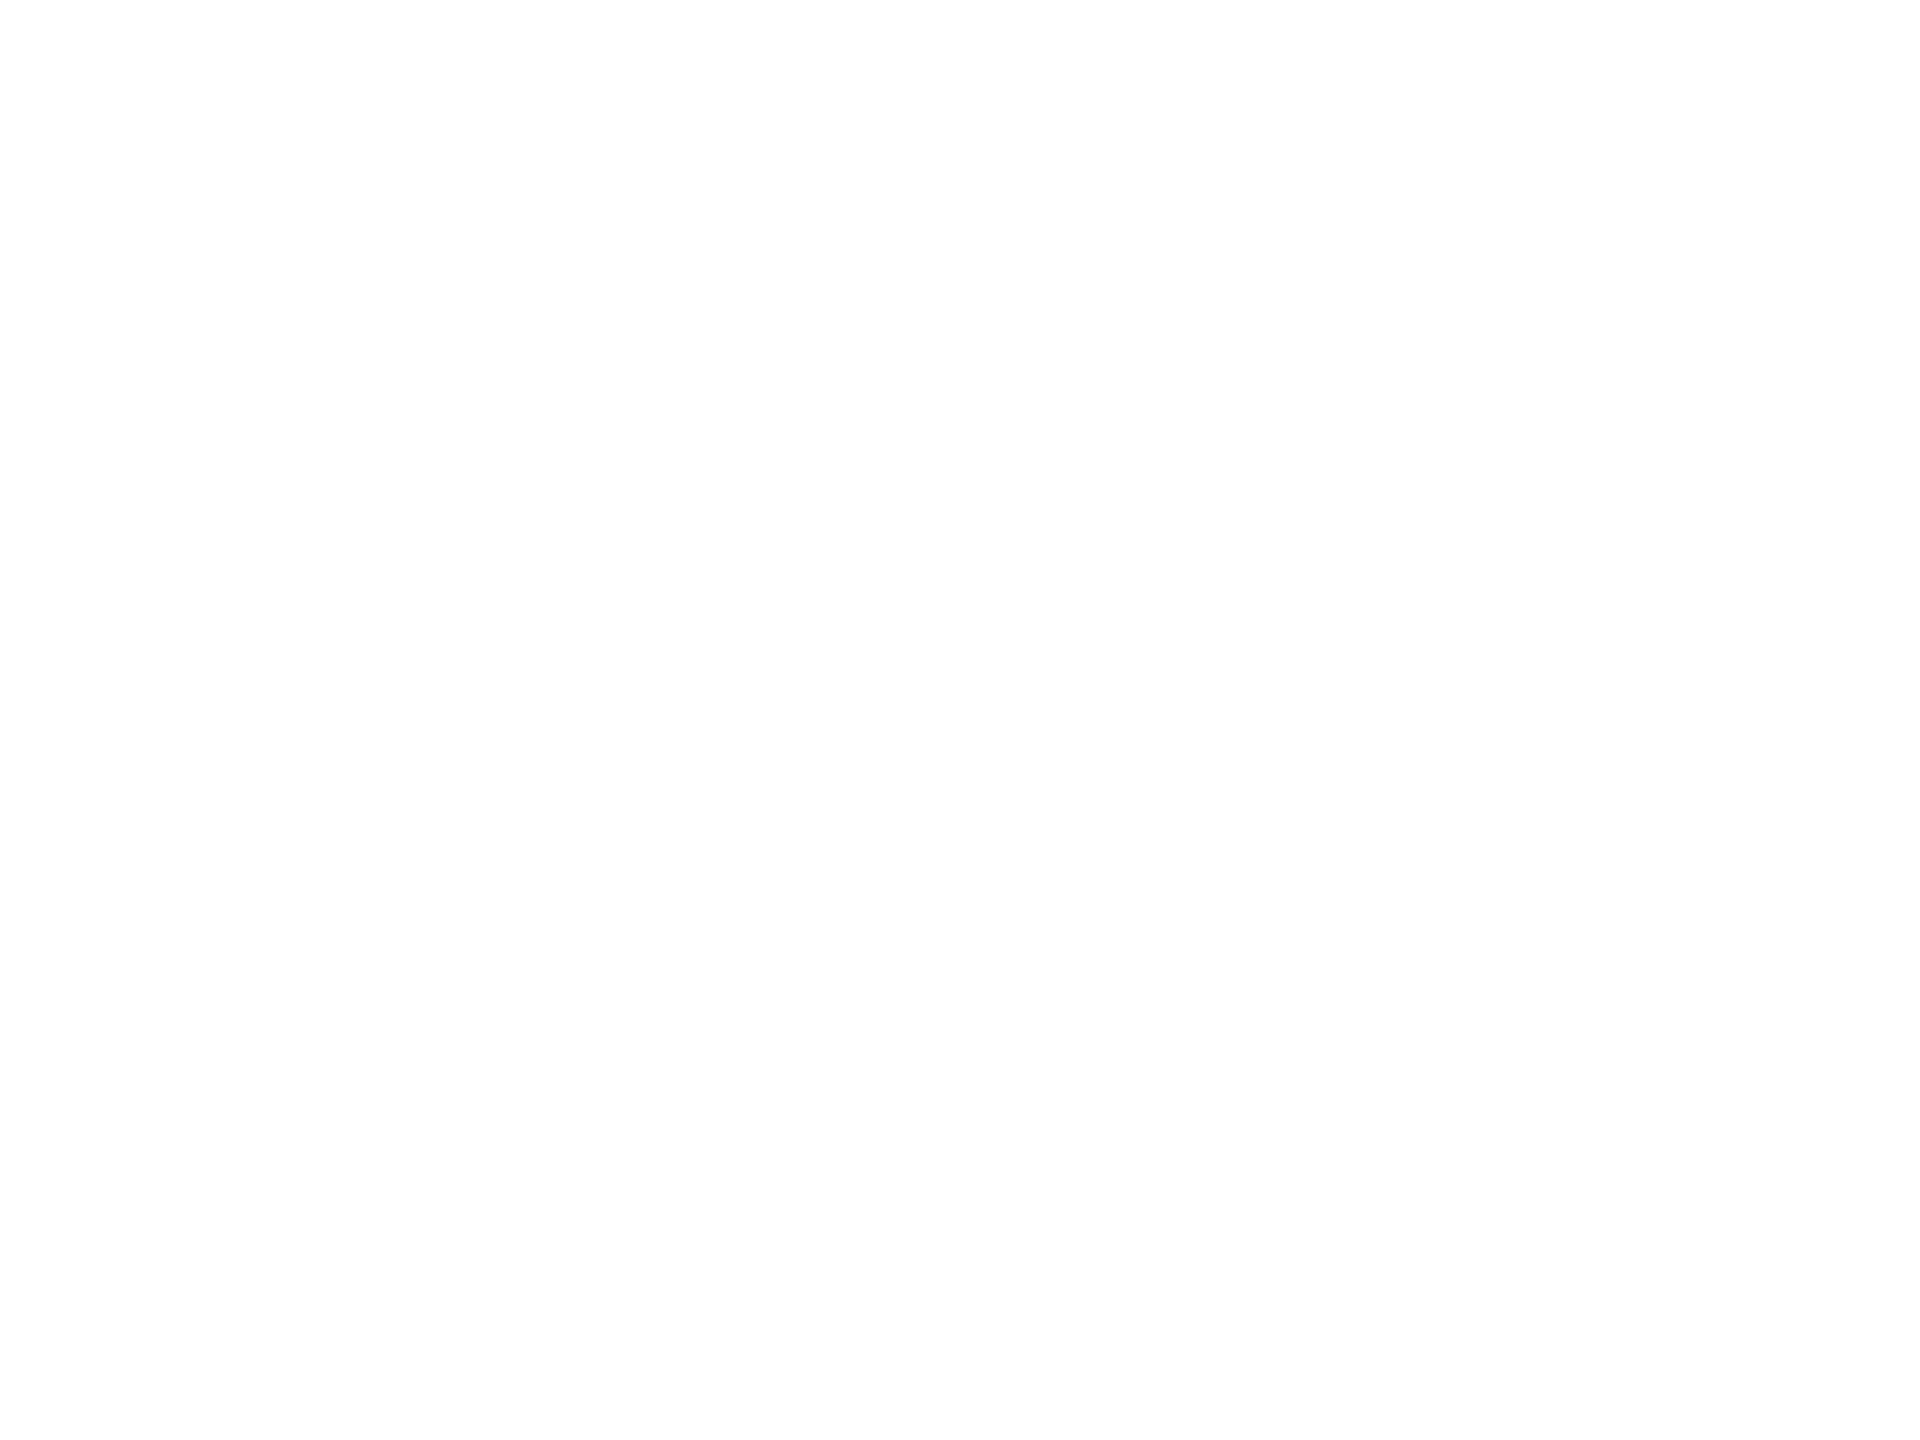 img_5838